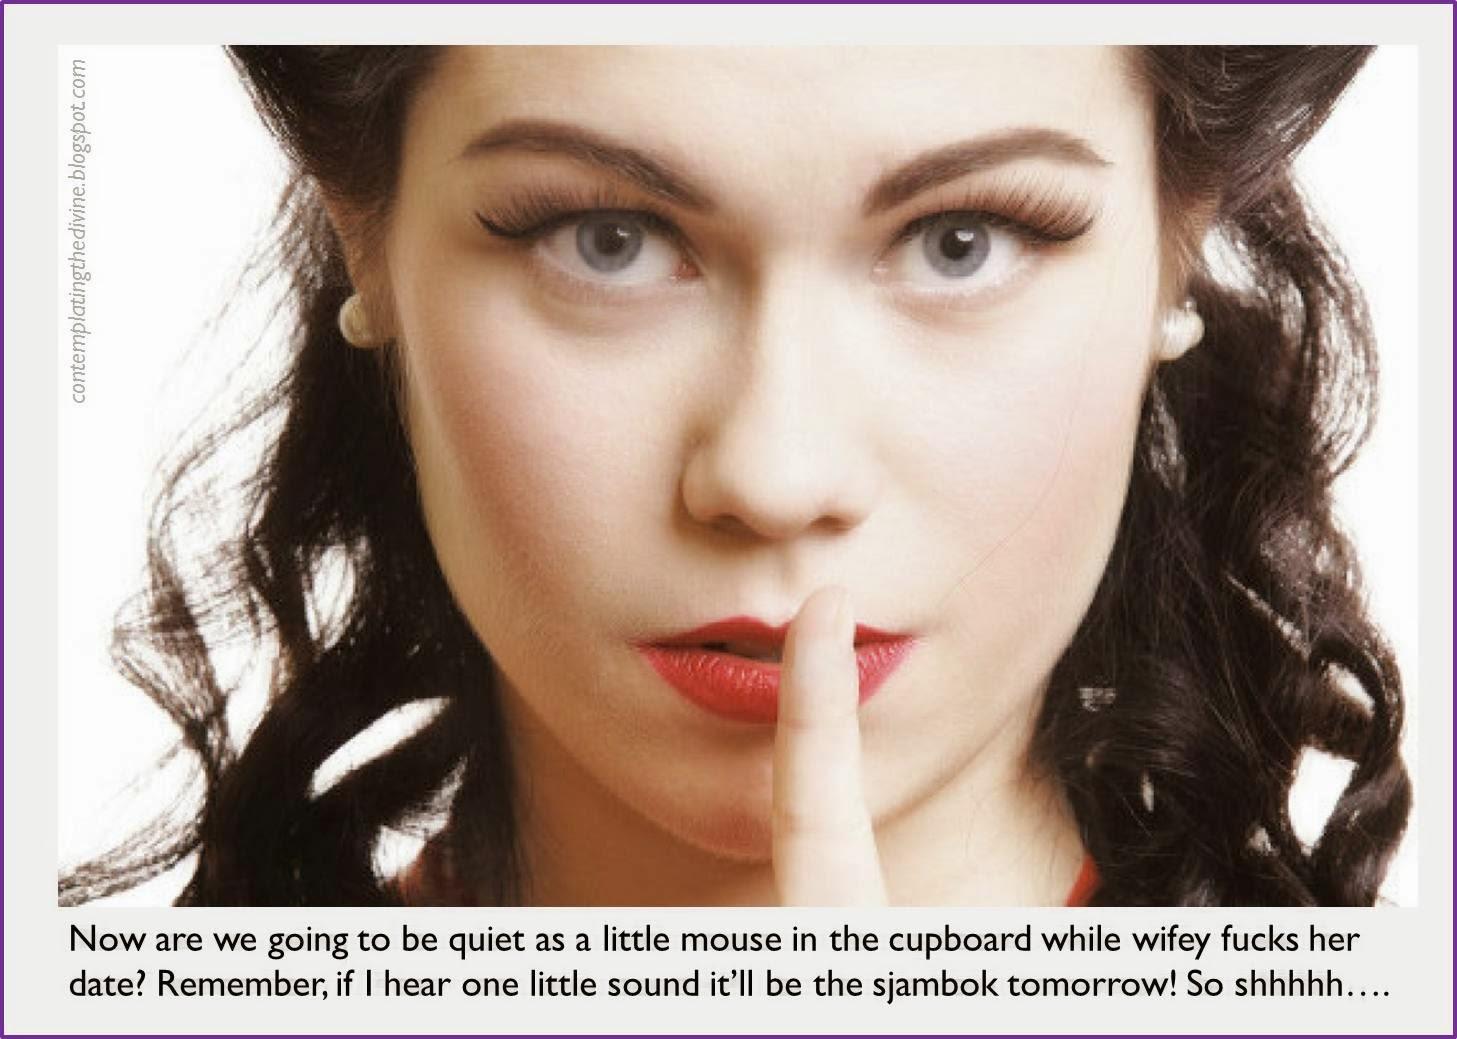 Silenced cuckold femdom